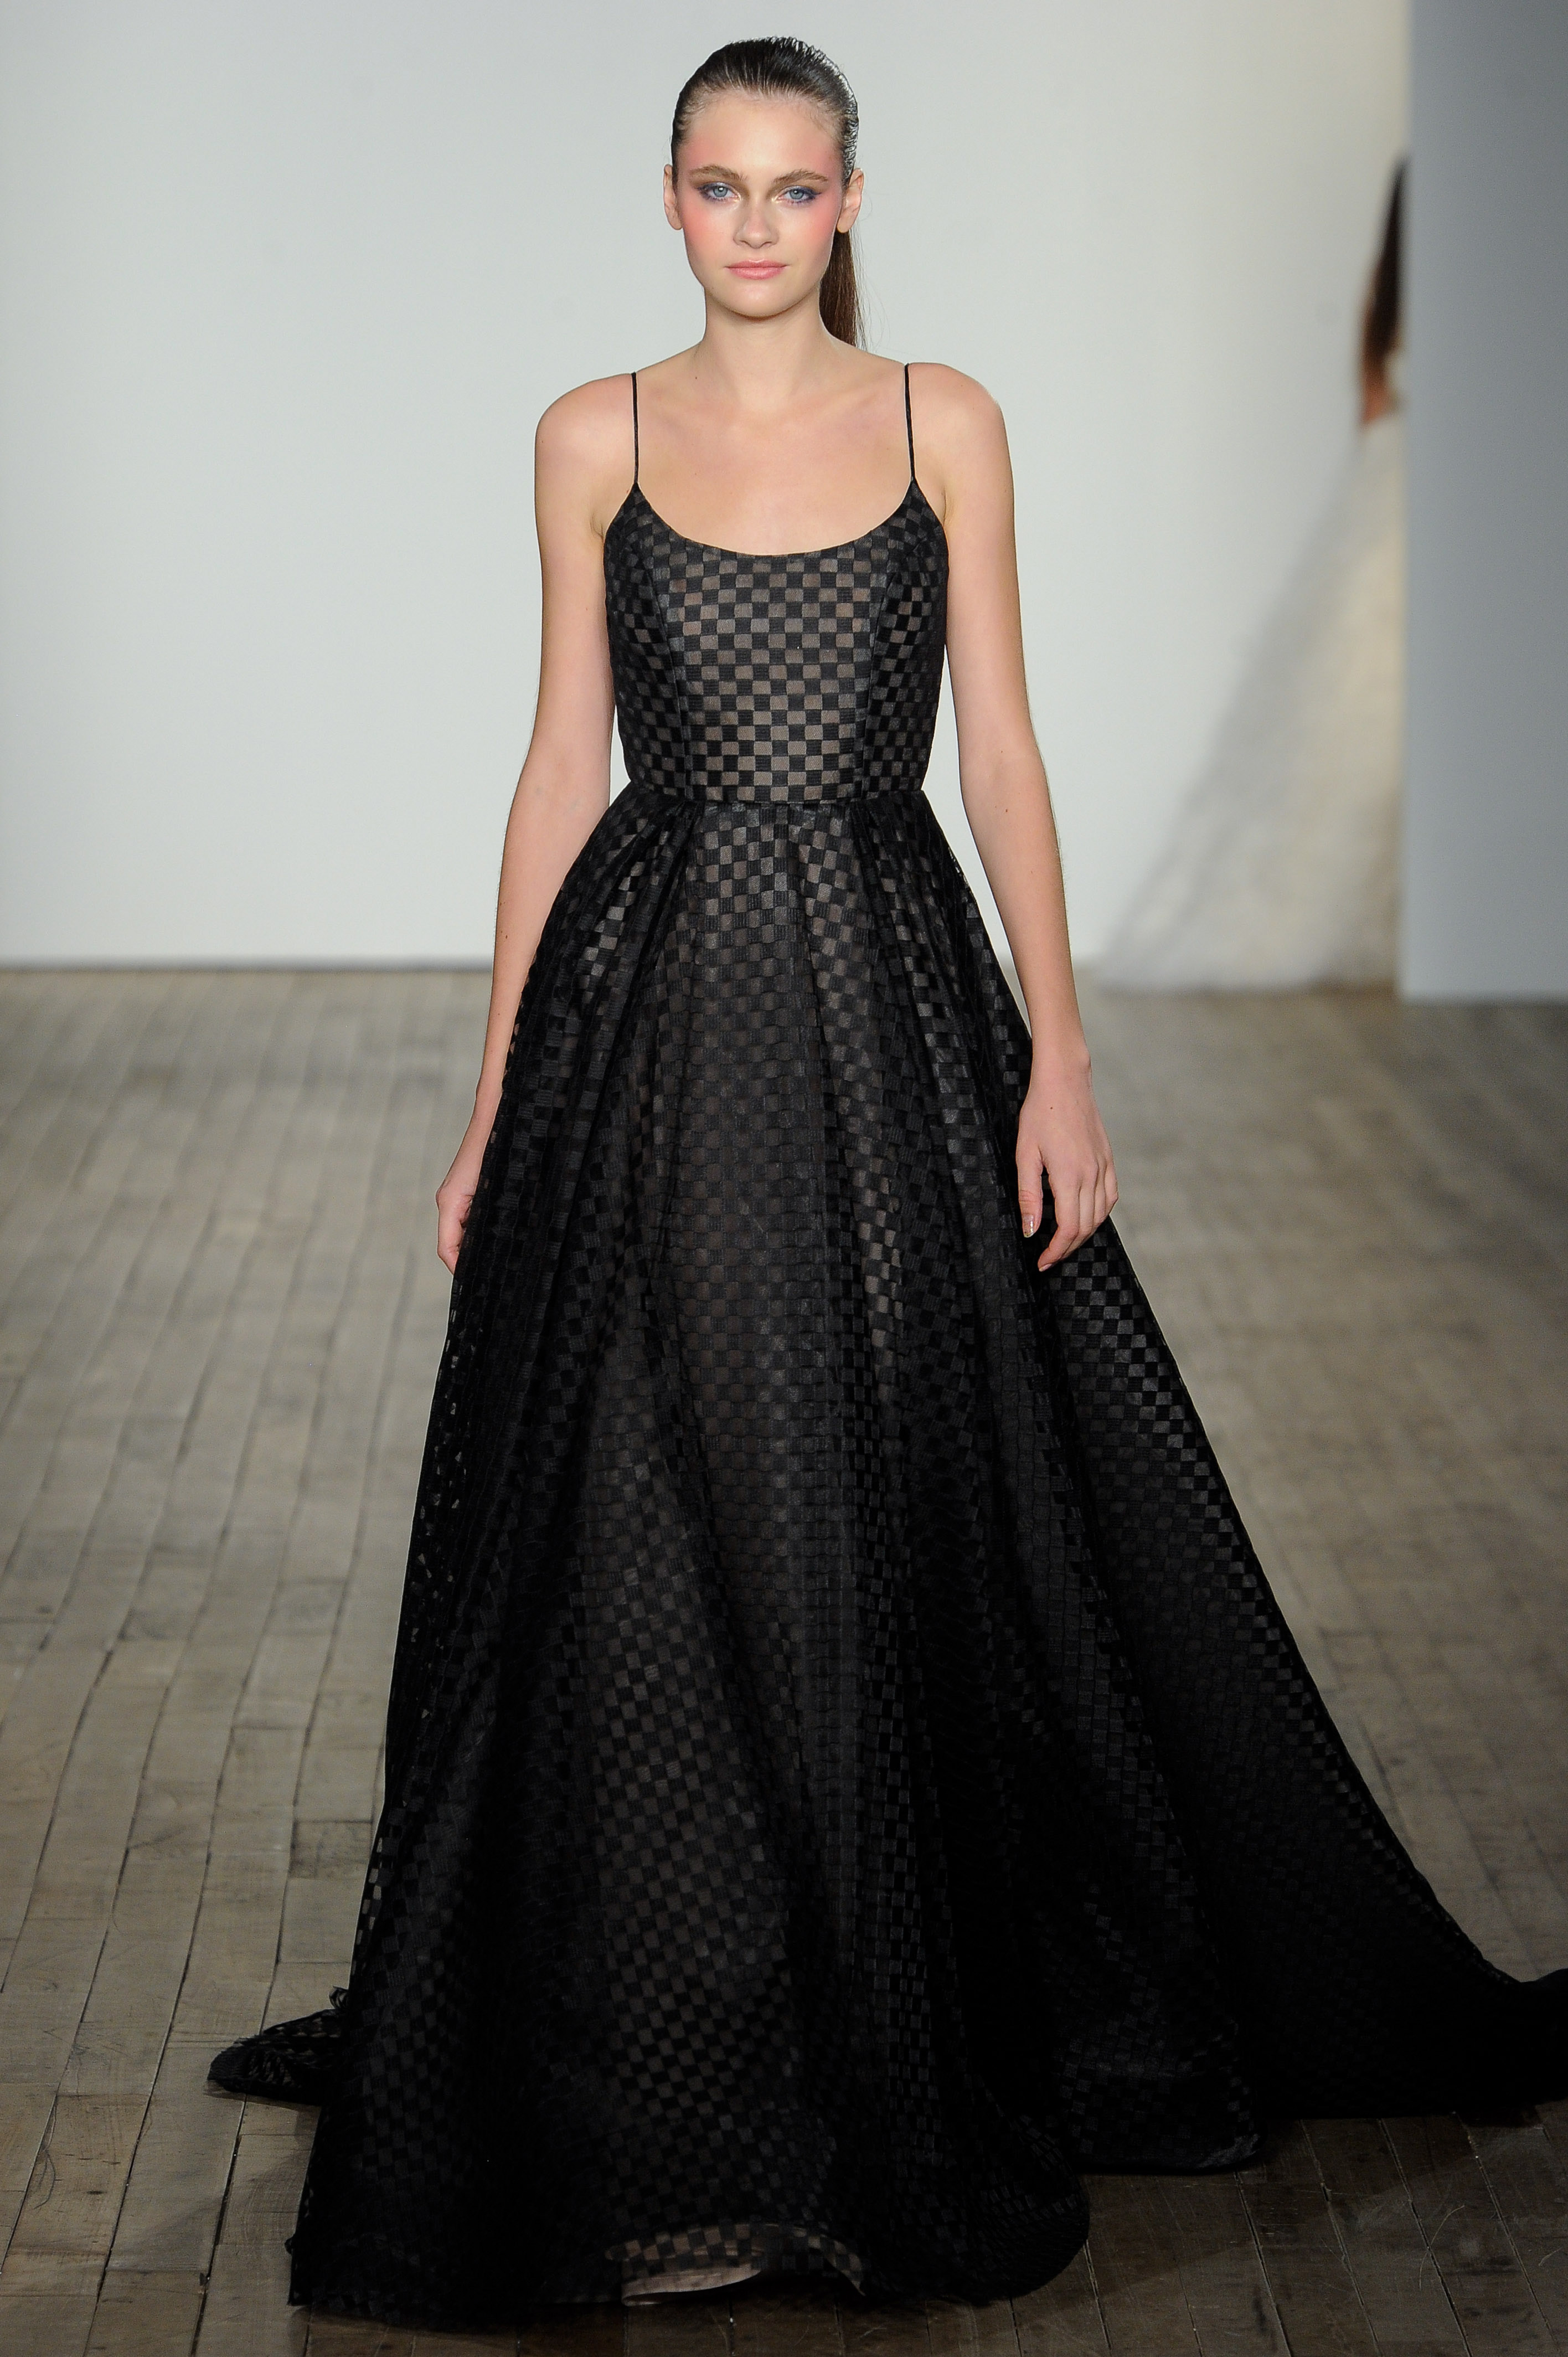 haley paige fall 2019 spaghetti strap a-line black wedding dress